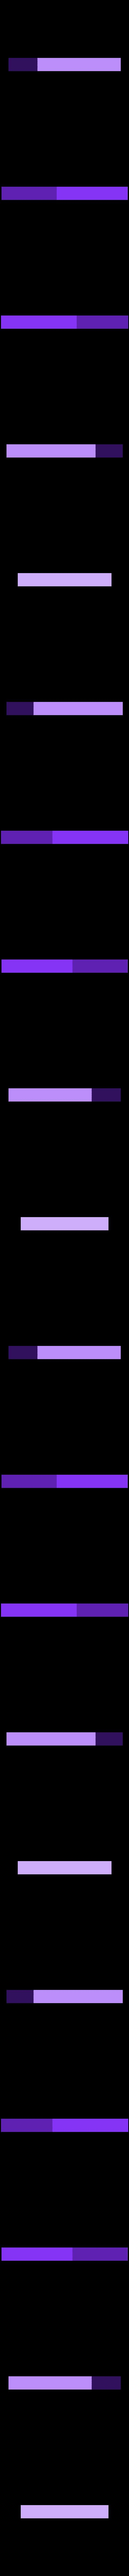 Raspberry_Pi_3B%2B_Sleeve.Raspberry_Pi_3B..Body3.stl Télécharger fichier STL gratuit Raspberry Pi 3B+ Sleeve • Design à imprimer en 3D, Wilko